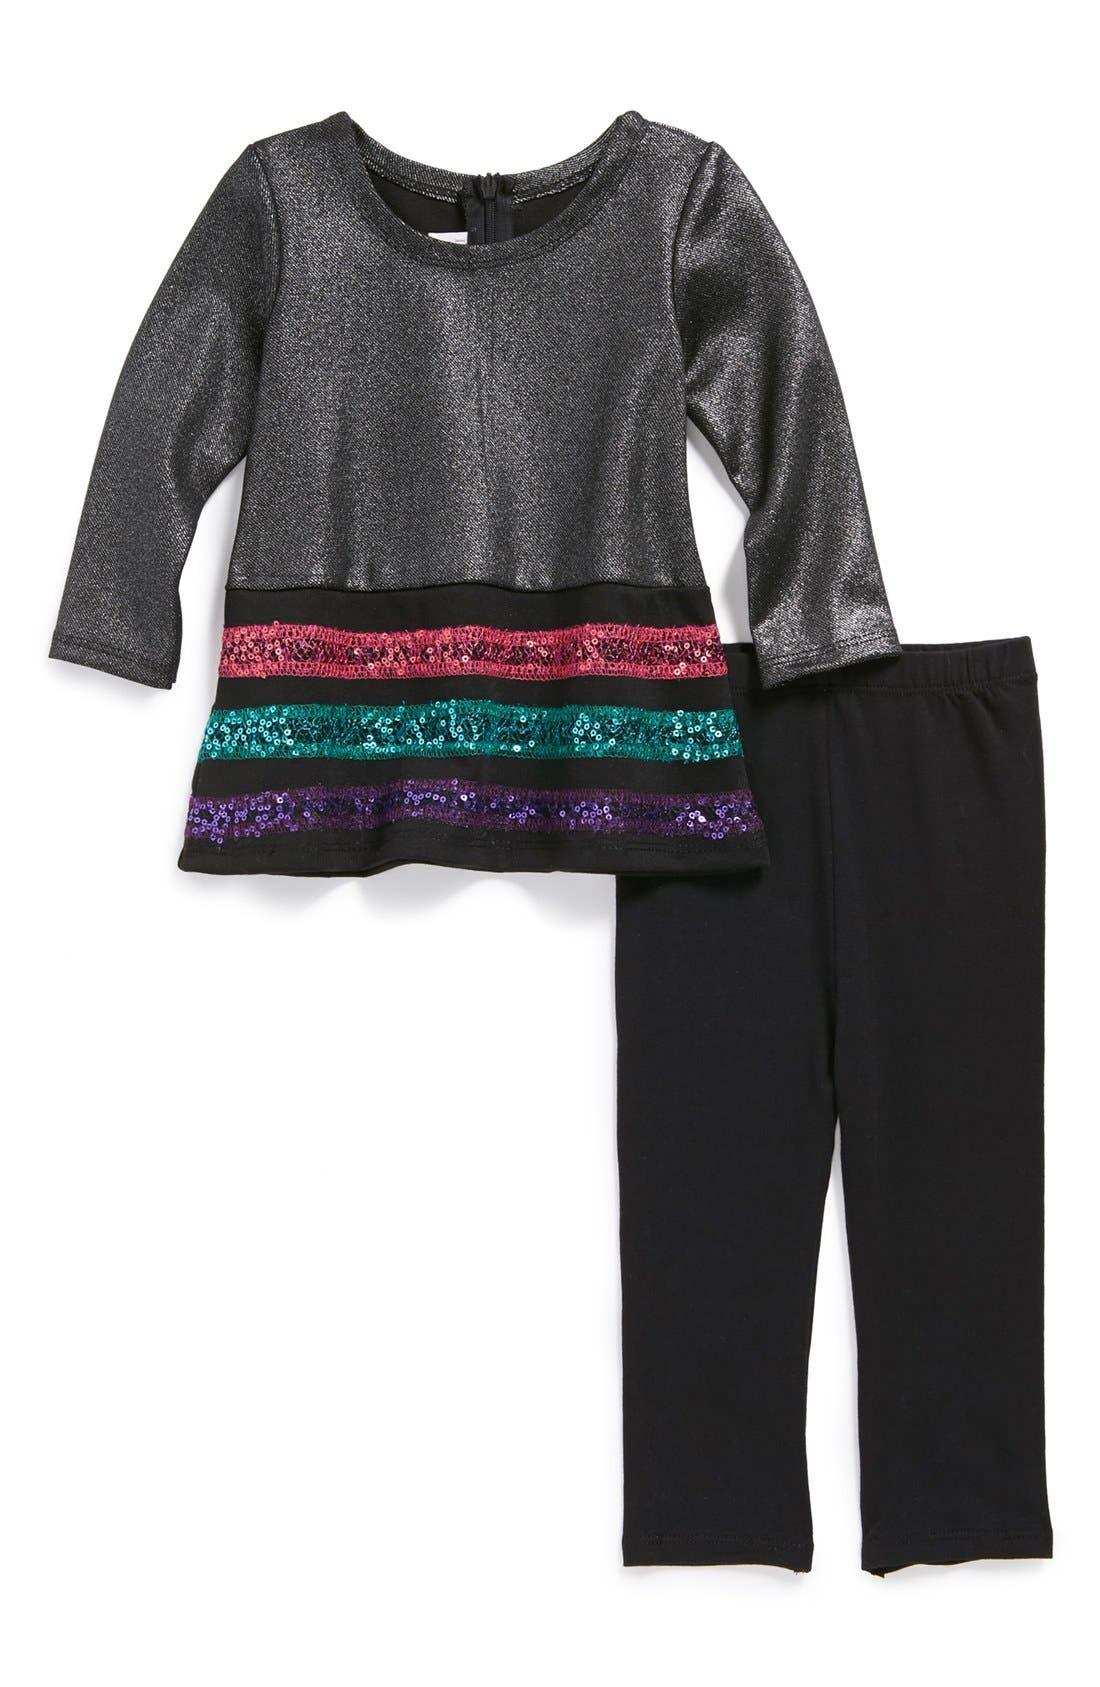 Alternate Image 1 Selected - Iris & Ivy Sequin Dress & Leggings (Toddler Girls)